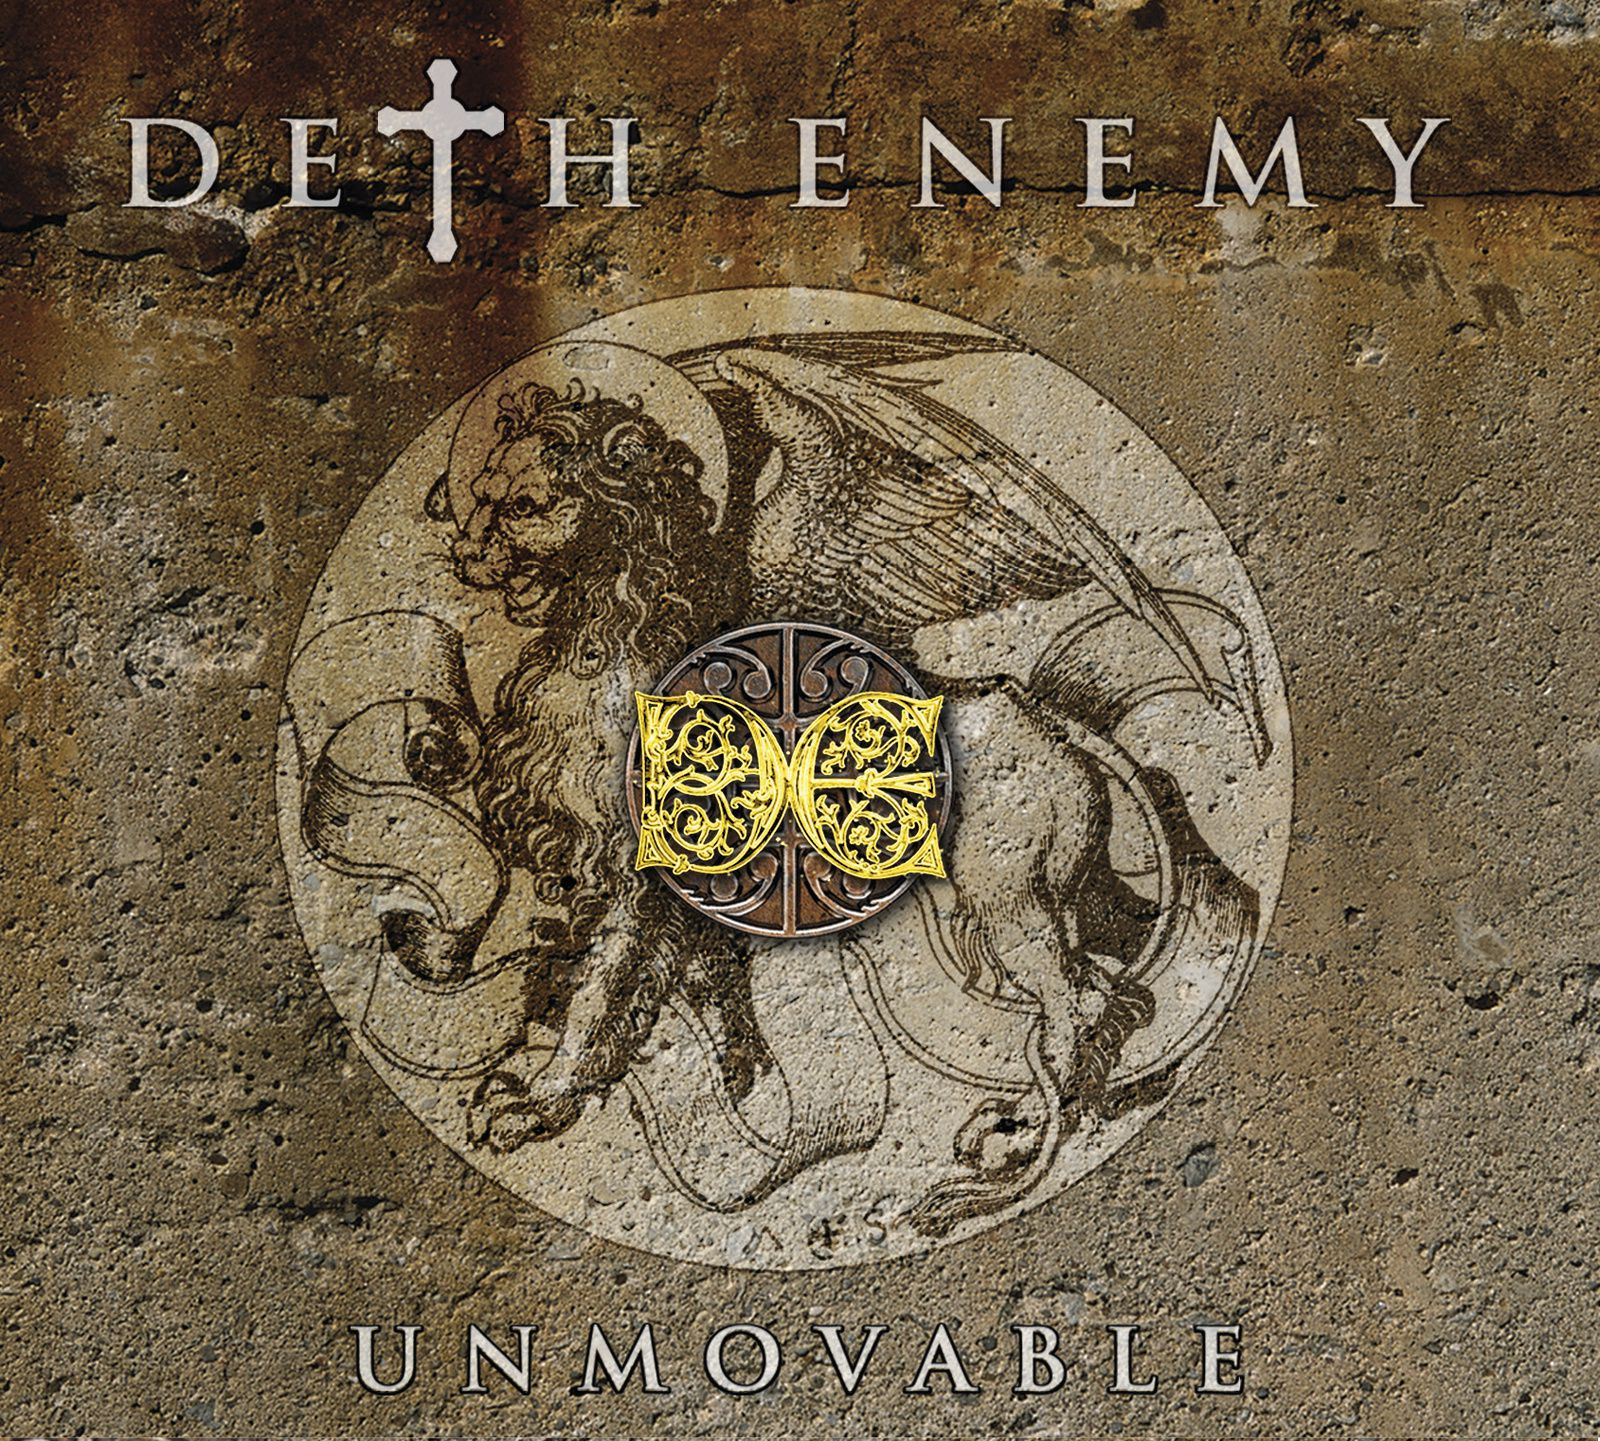 CD review DETH ENEMY &quot&#x3B;Unmovable&quot&#x3B;